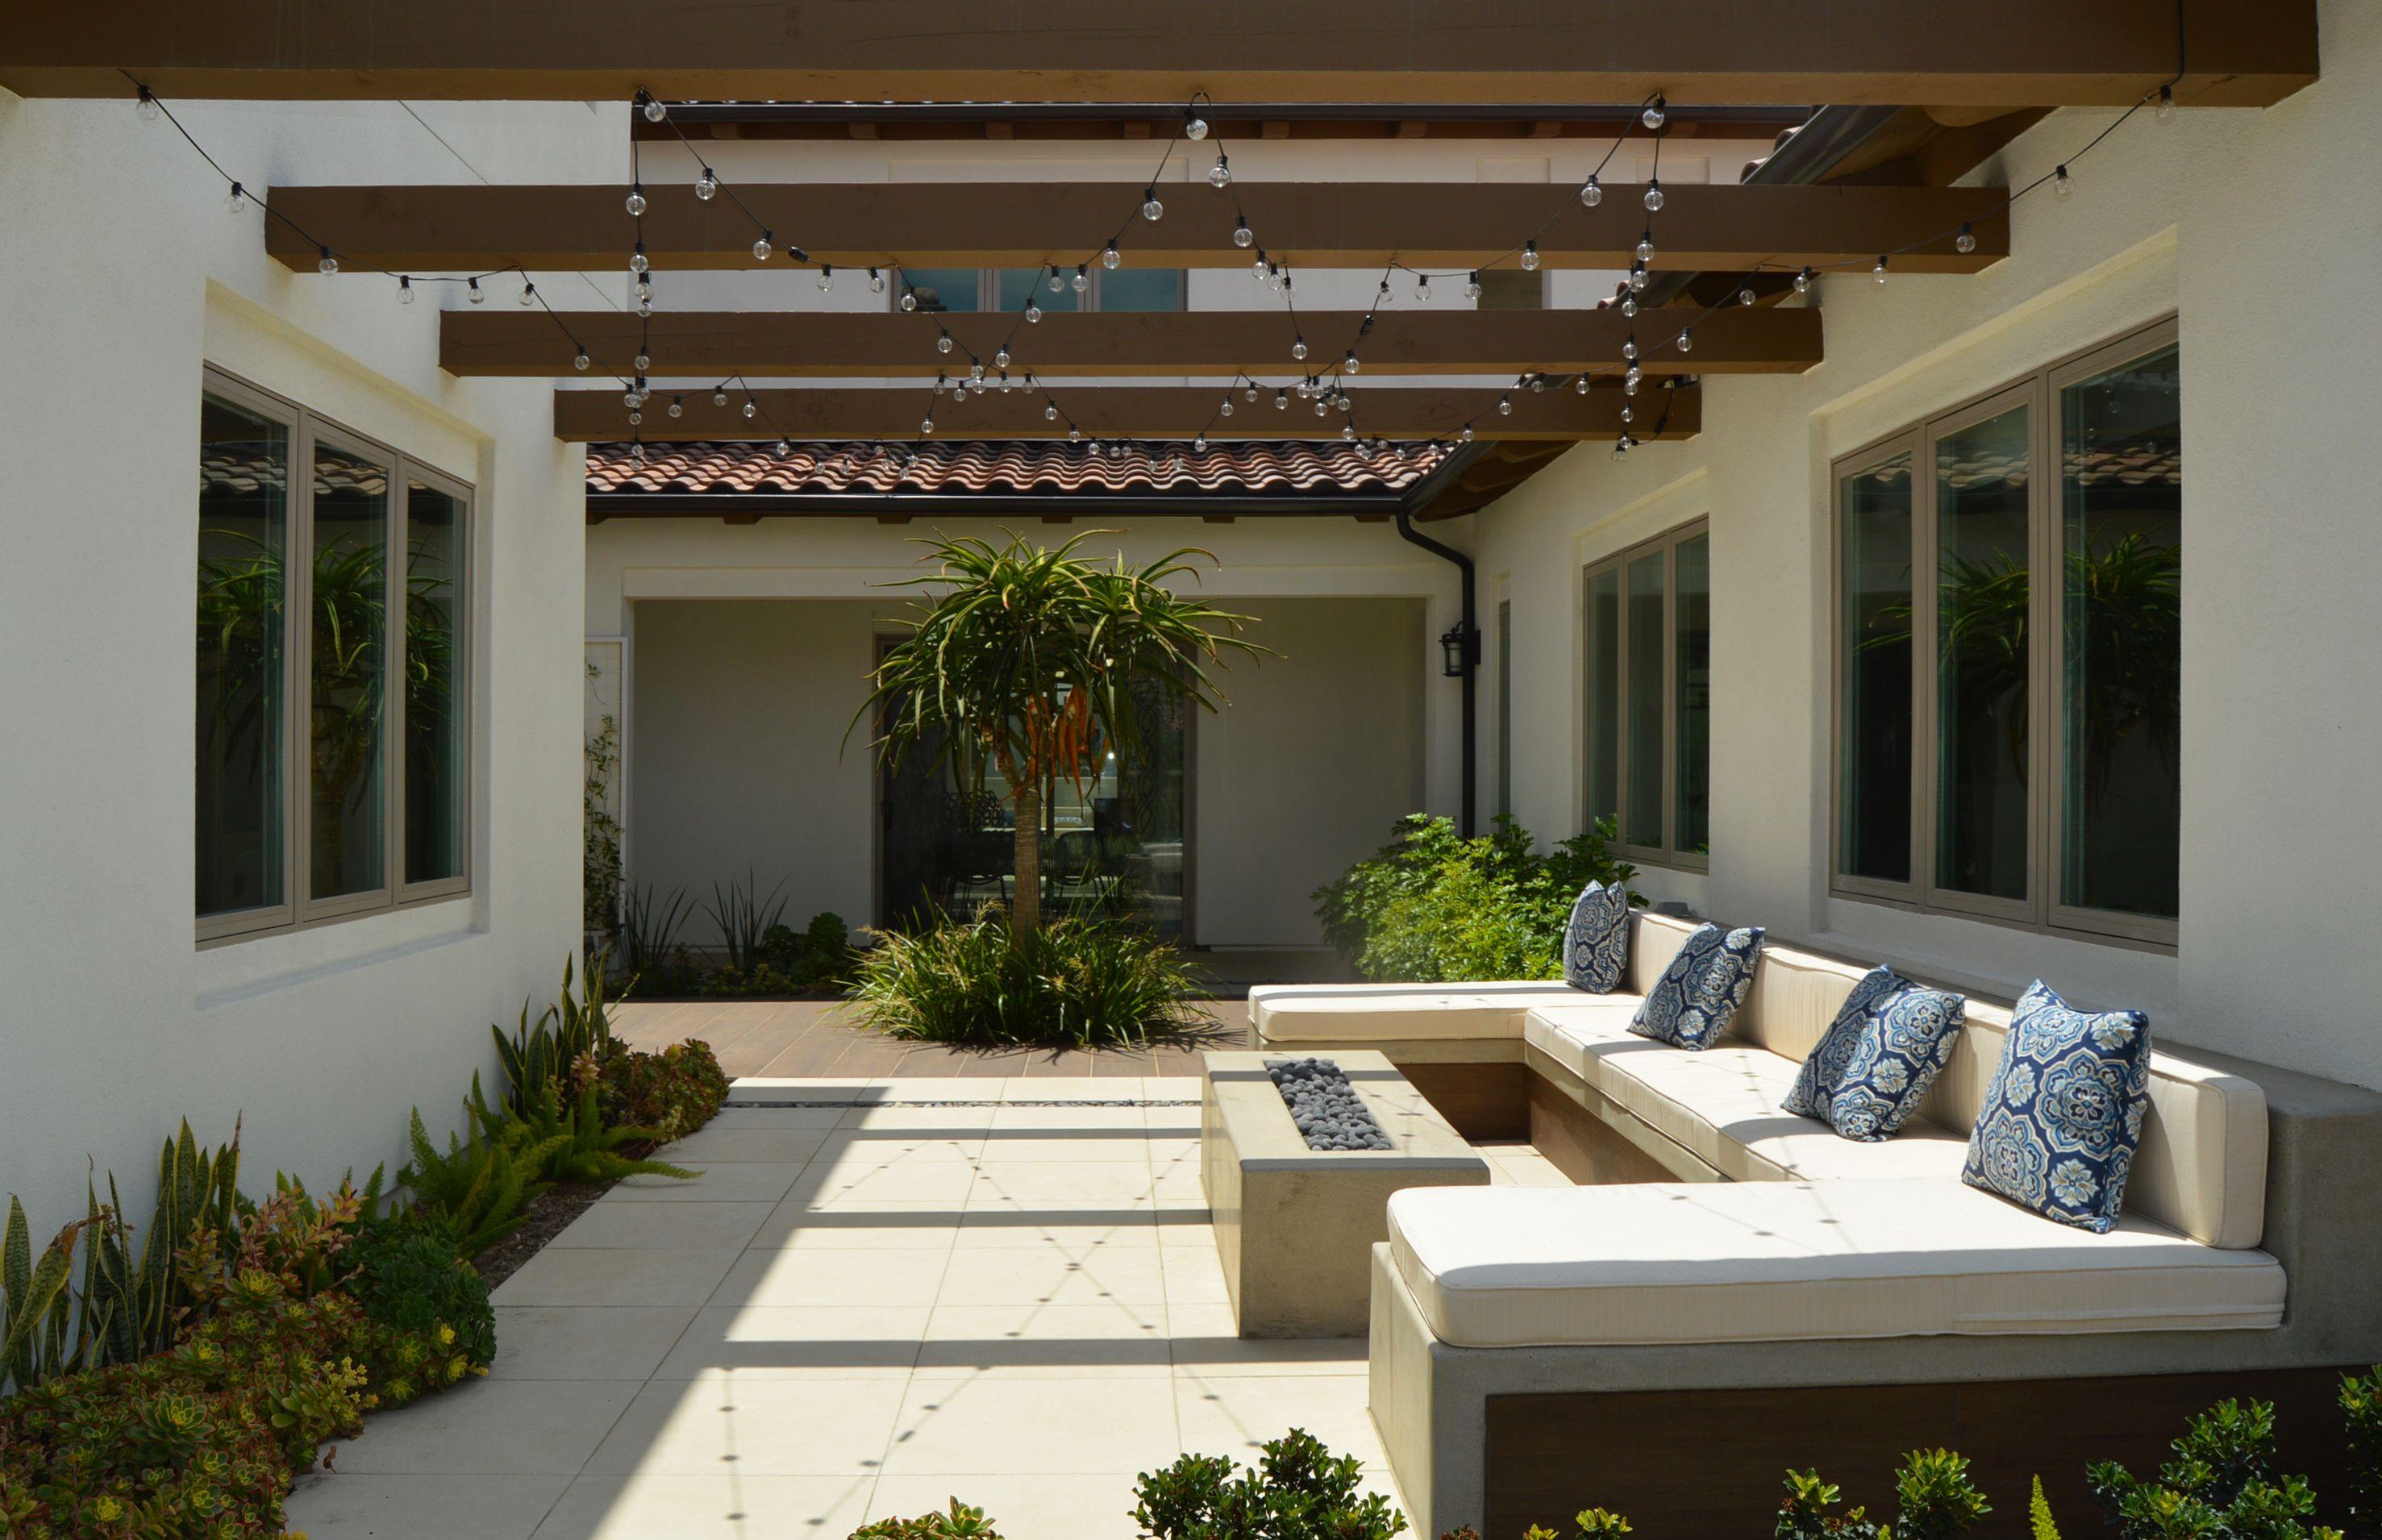 Hardscape And Landscape Design At San Diego Landscapearchitecture